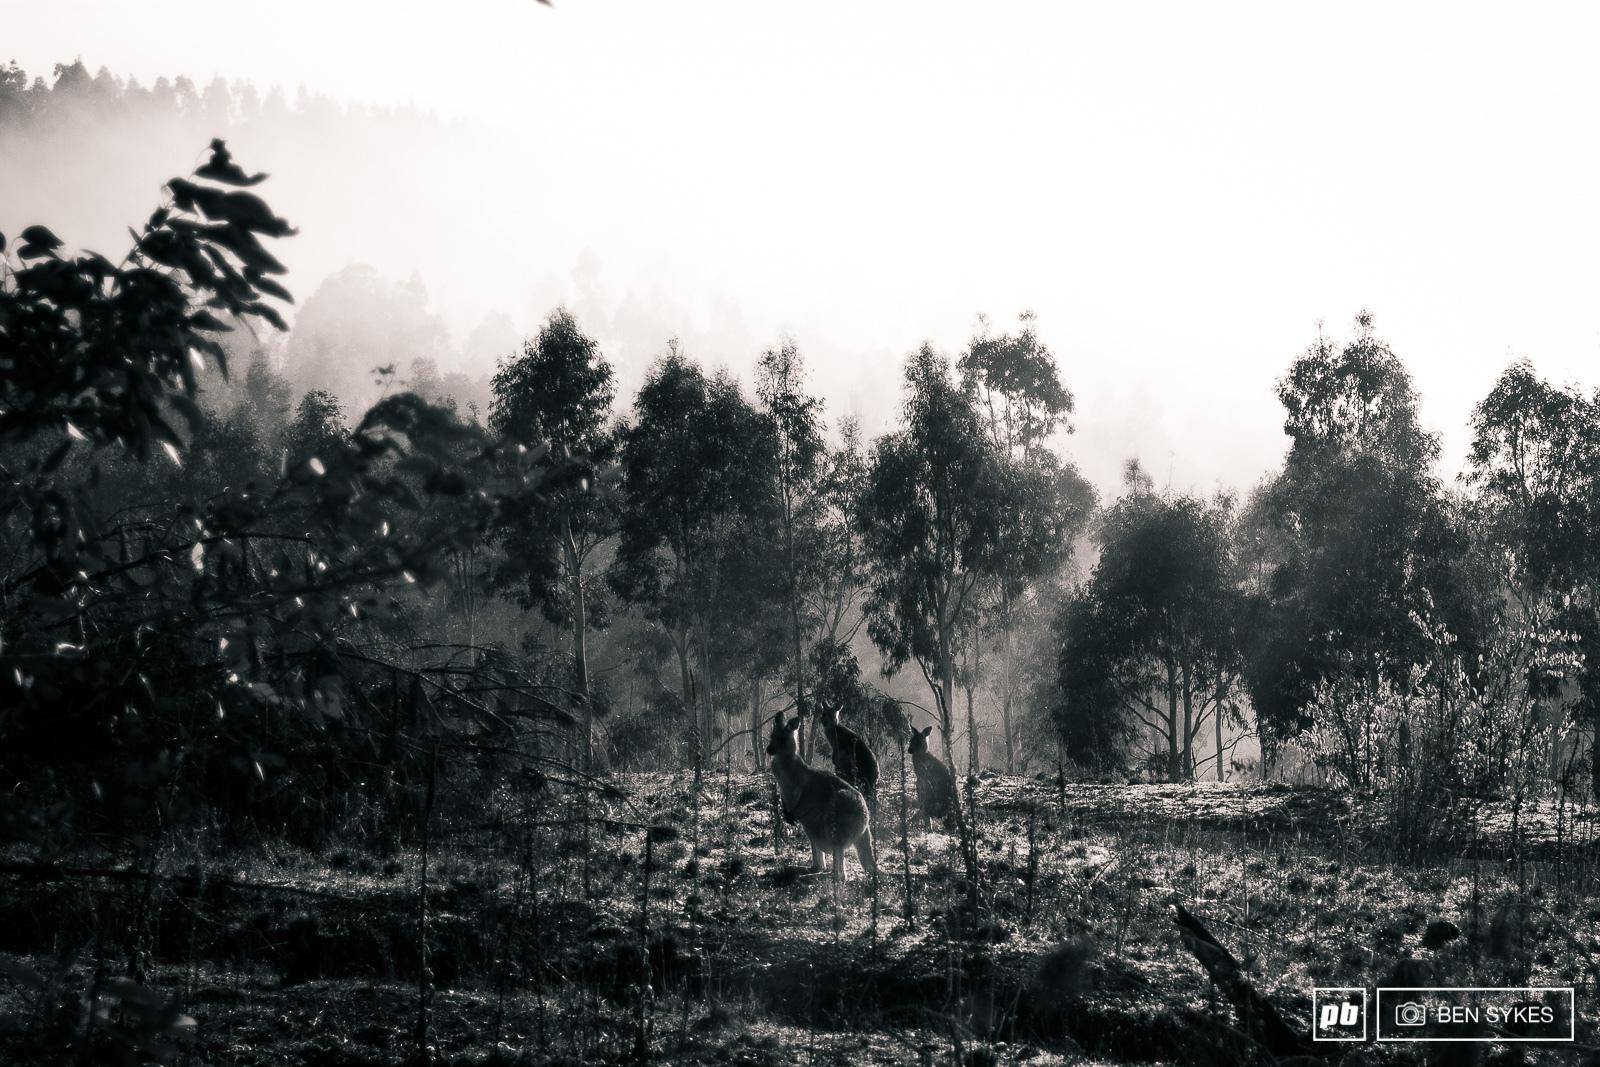 Kangaroos in the morning mist.